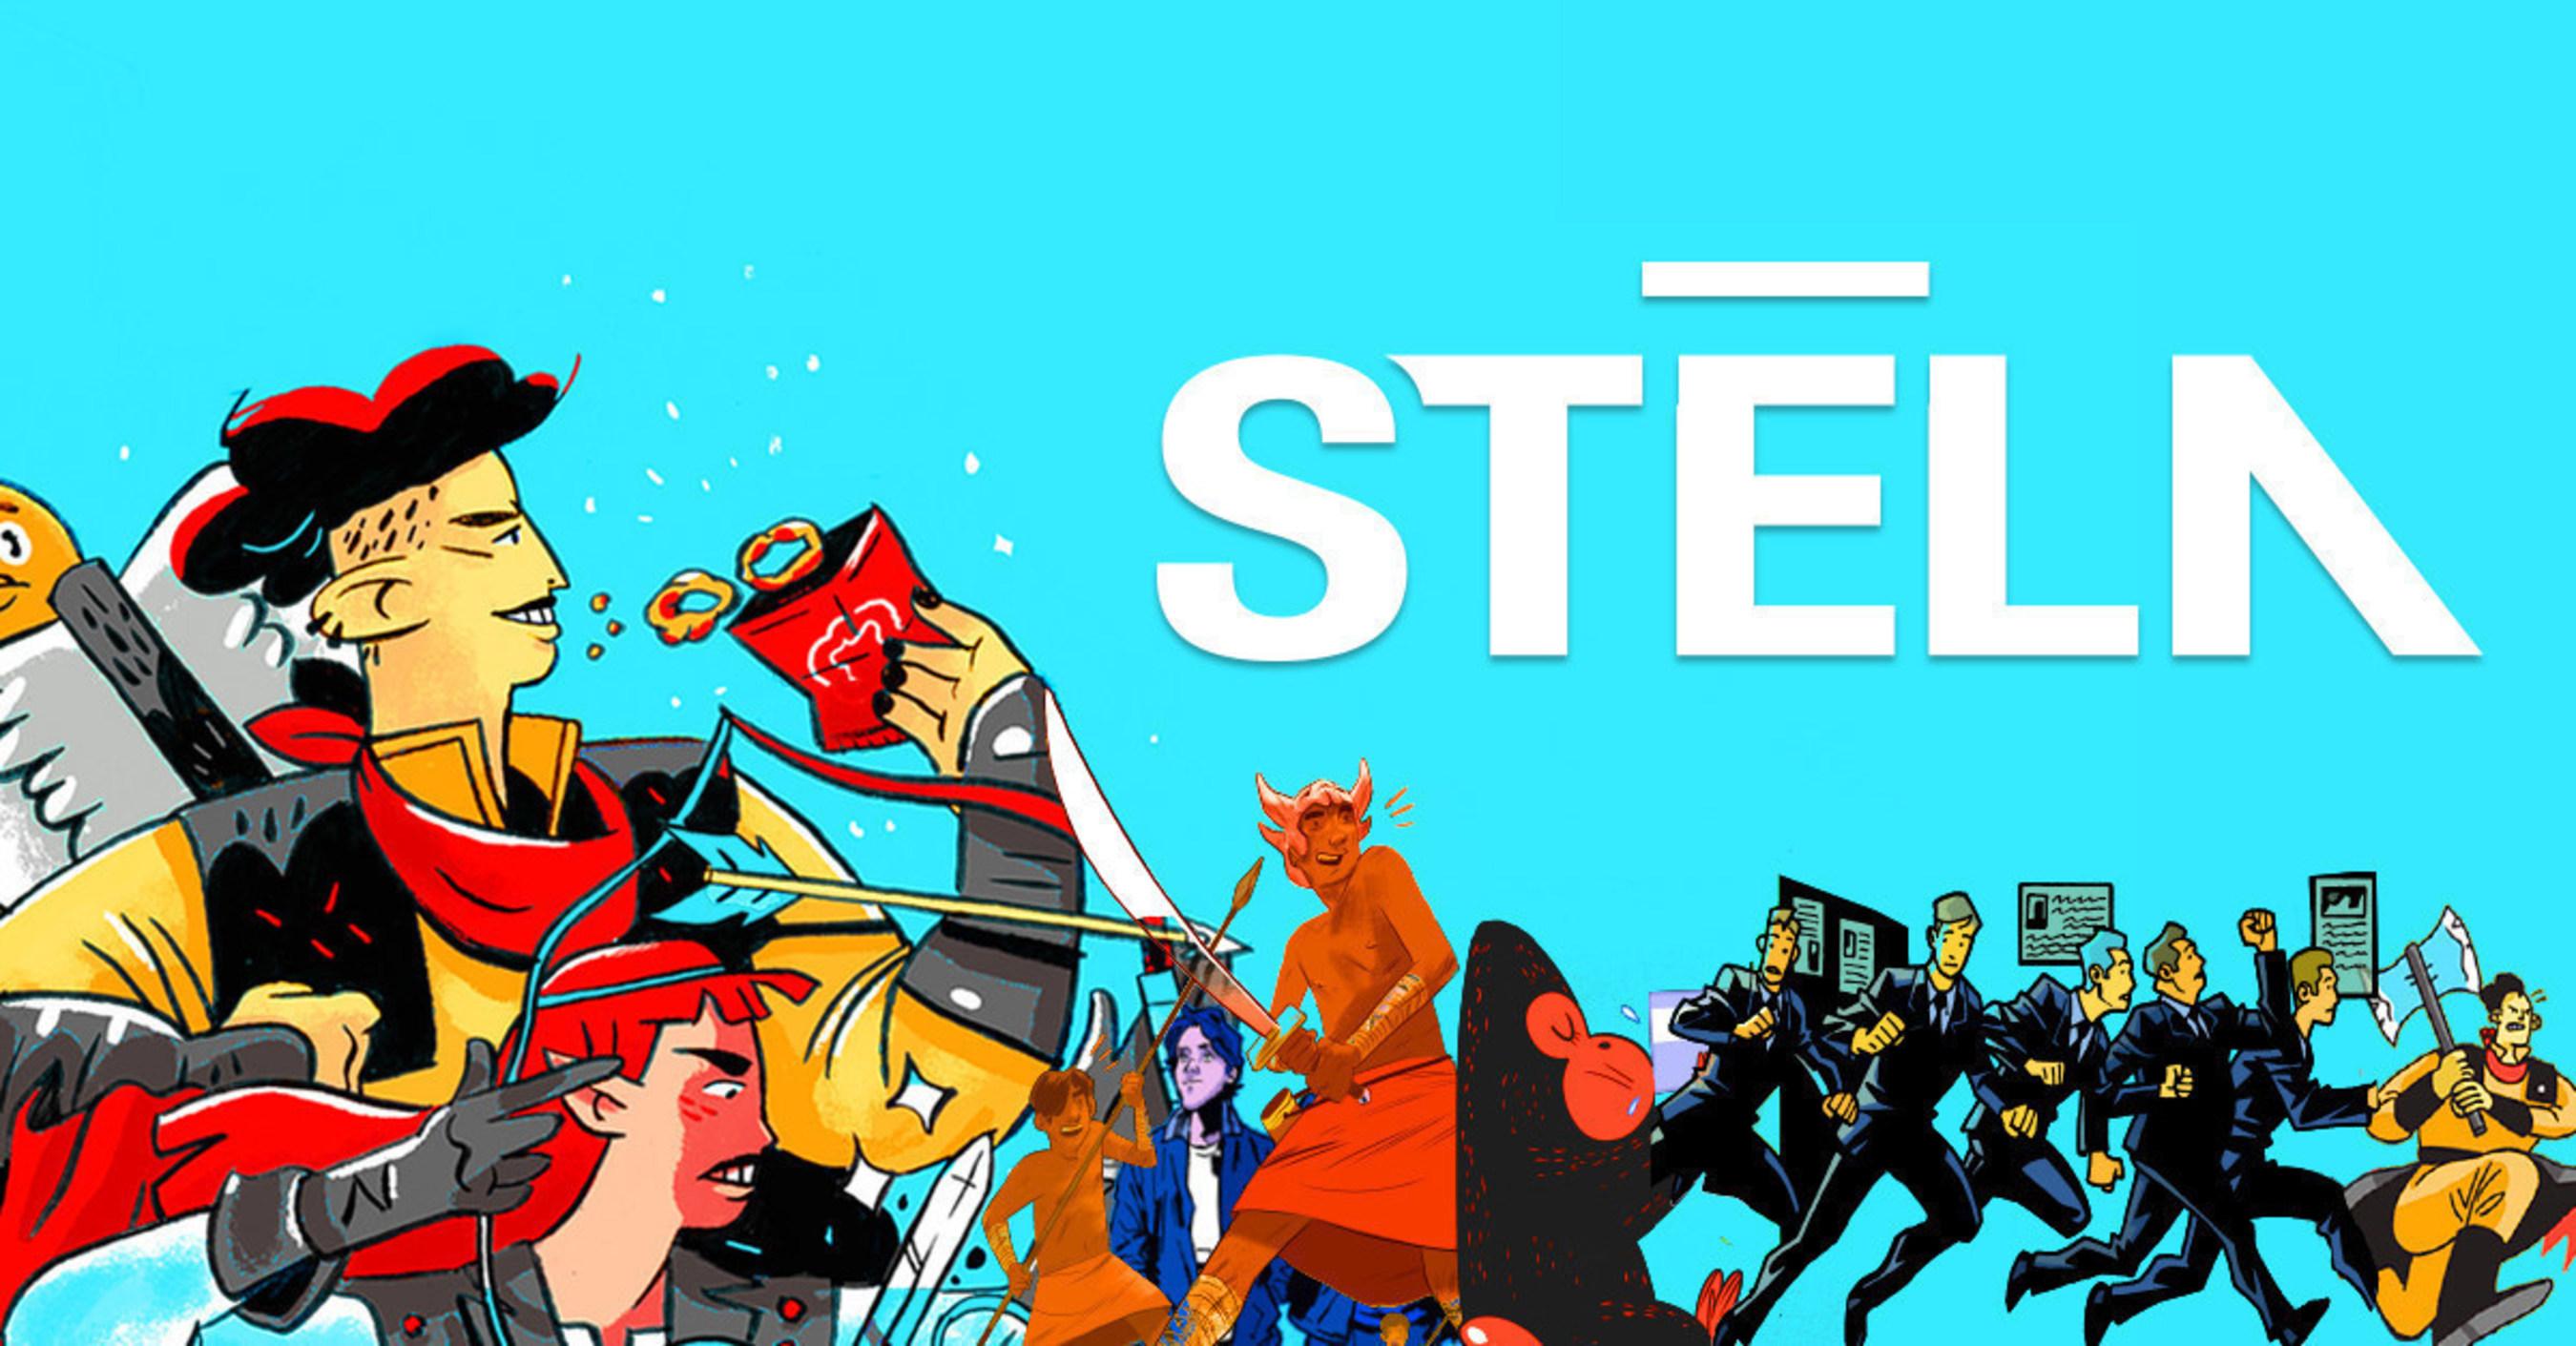 Premiere Mobile Entertainment Company Stela Launches New Marketplace App